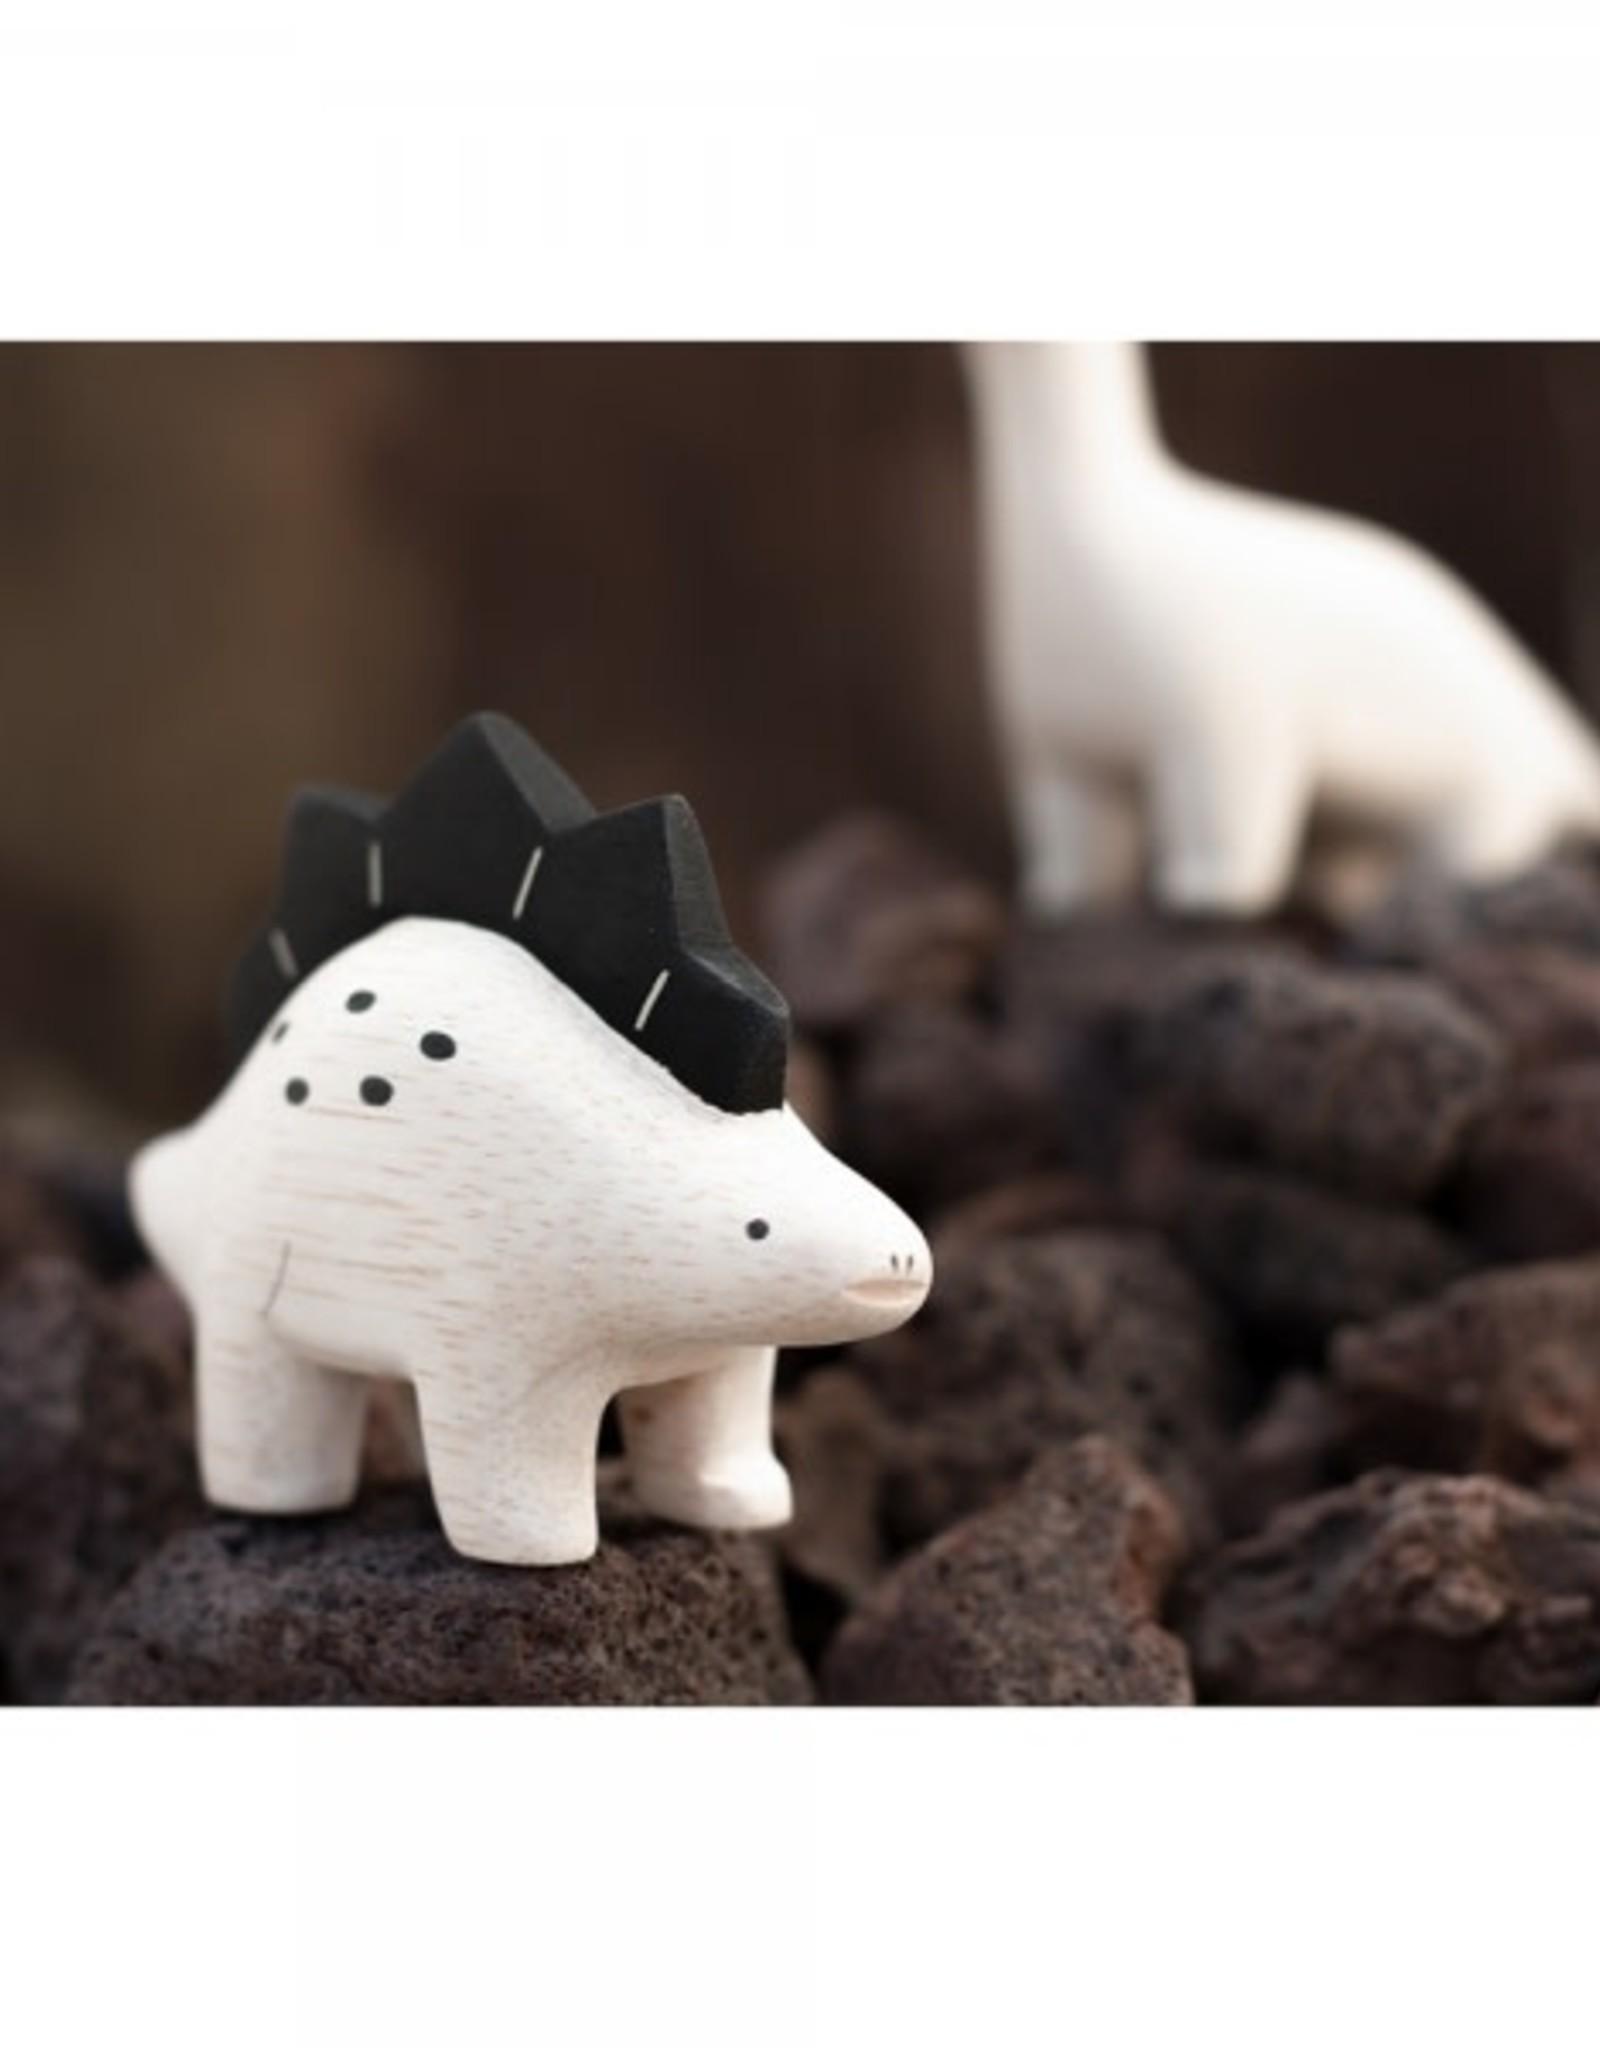 T-LAB Stegosaurus - T-LAB